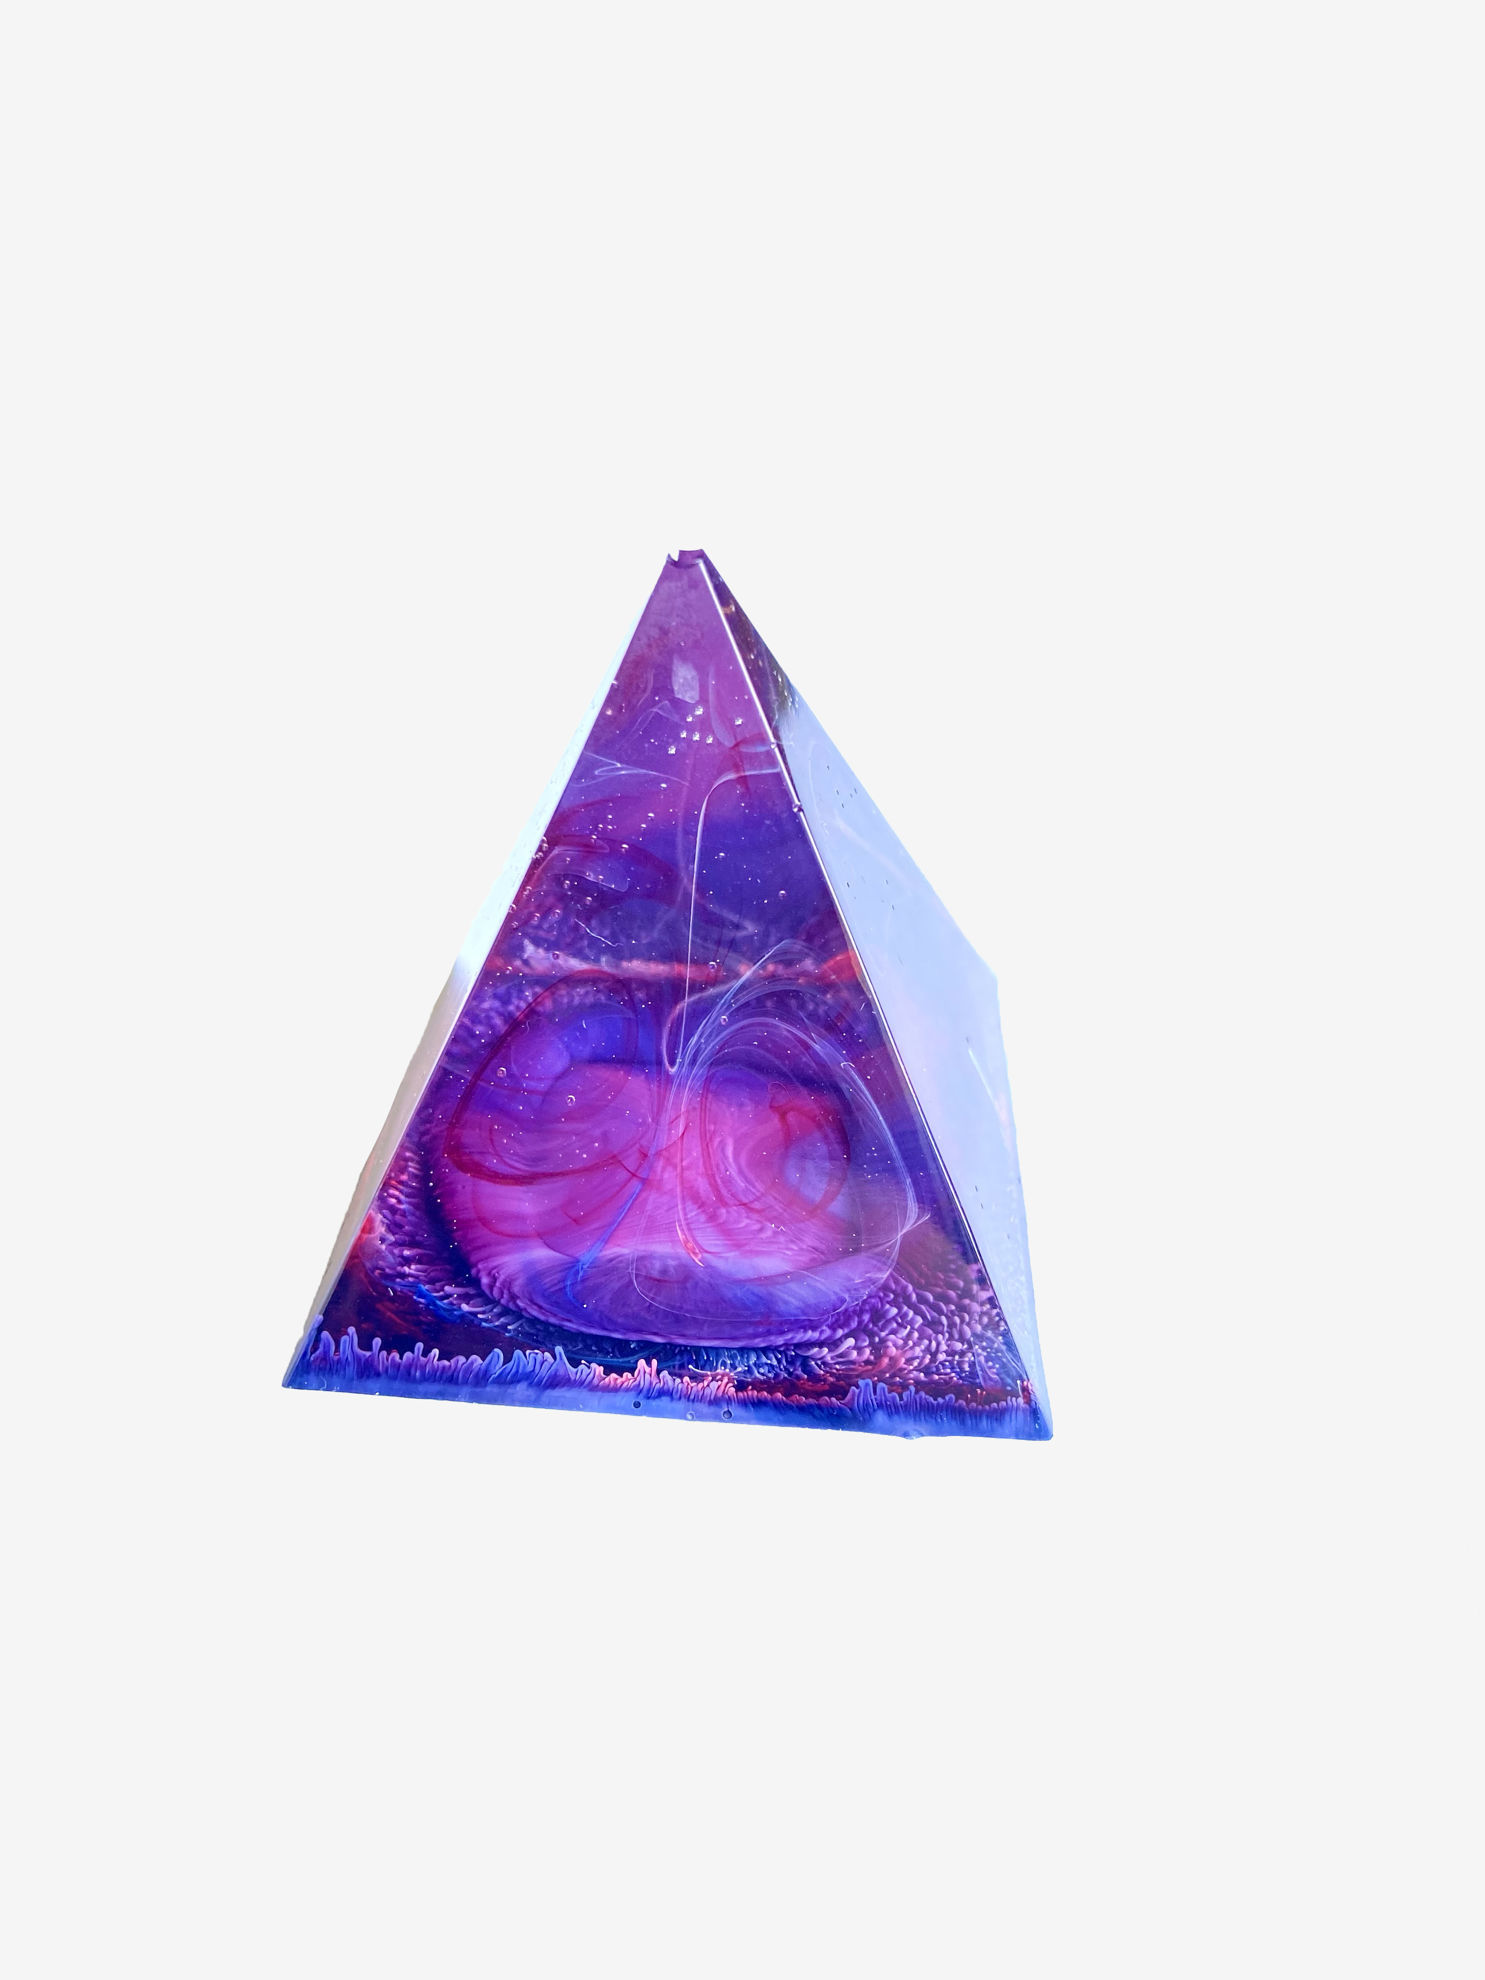 Galaxy Swirl Extra Small Pyramid by Spirited Pyramids